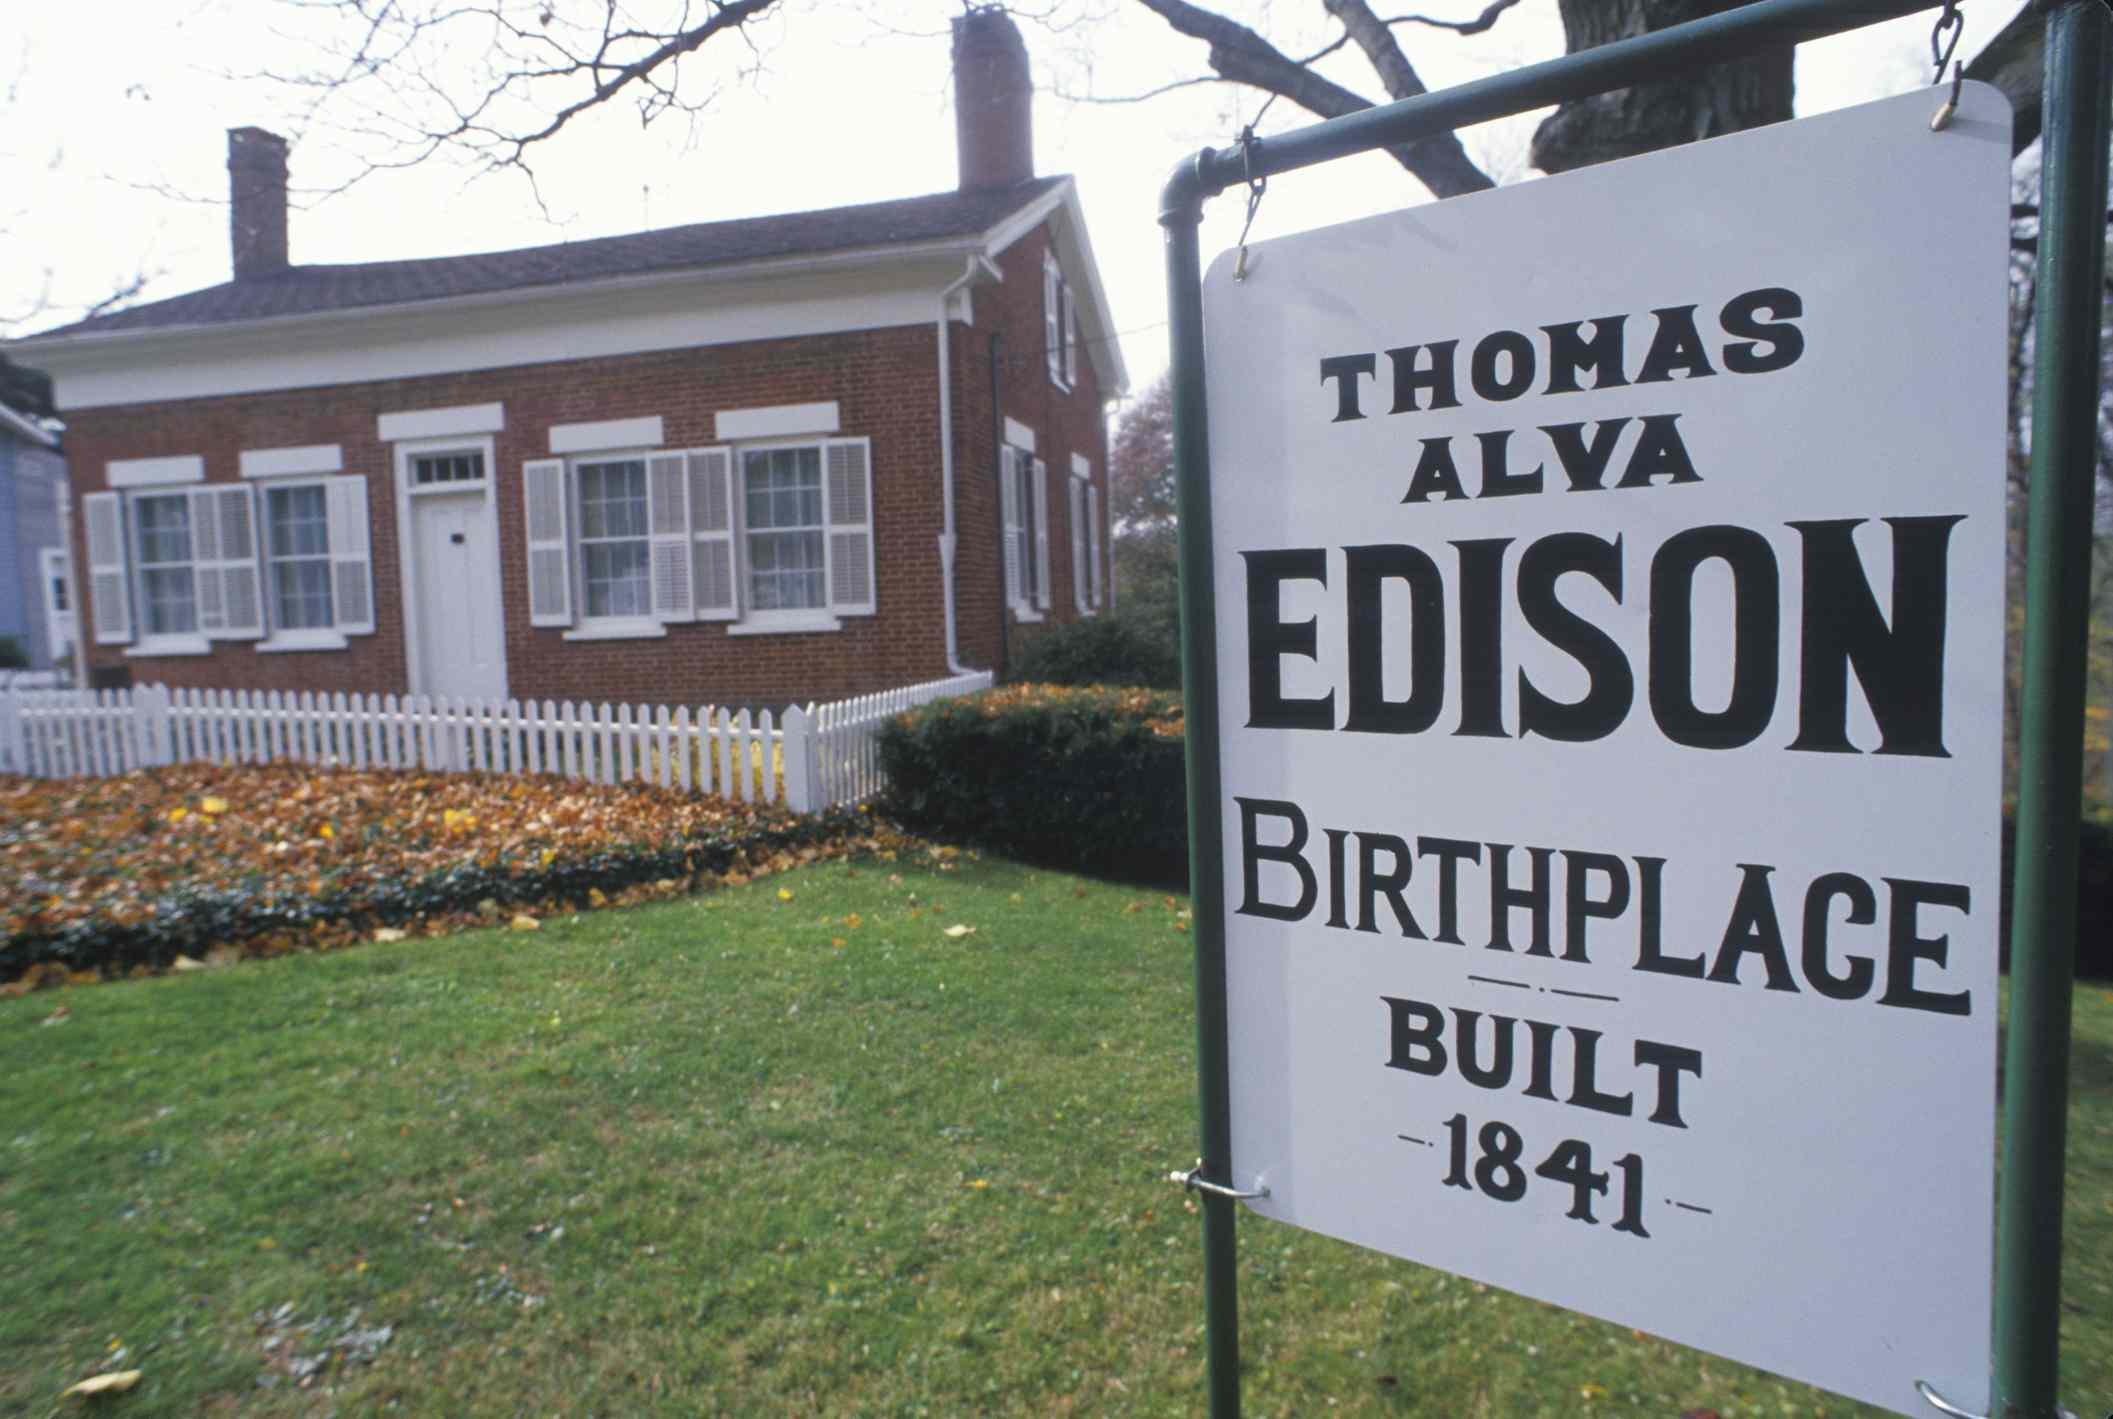 The Birthplace of Thomas Edison